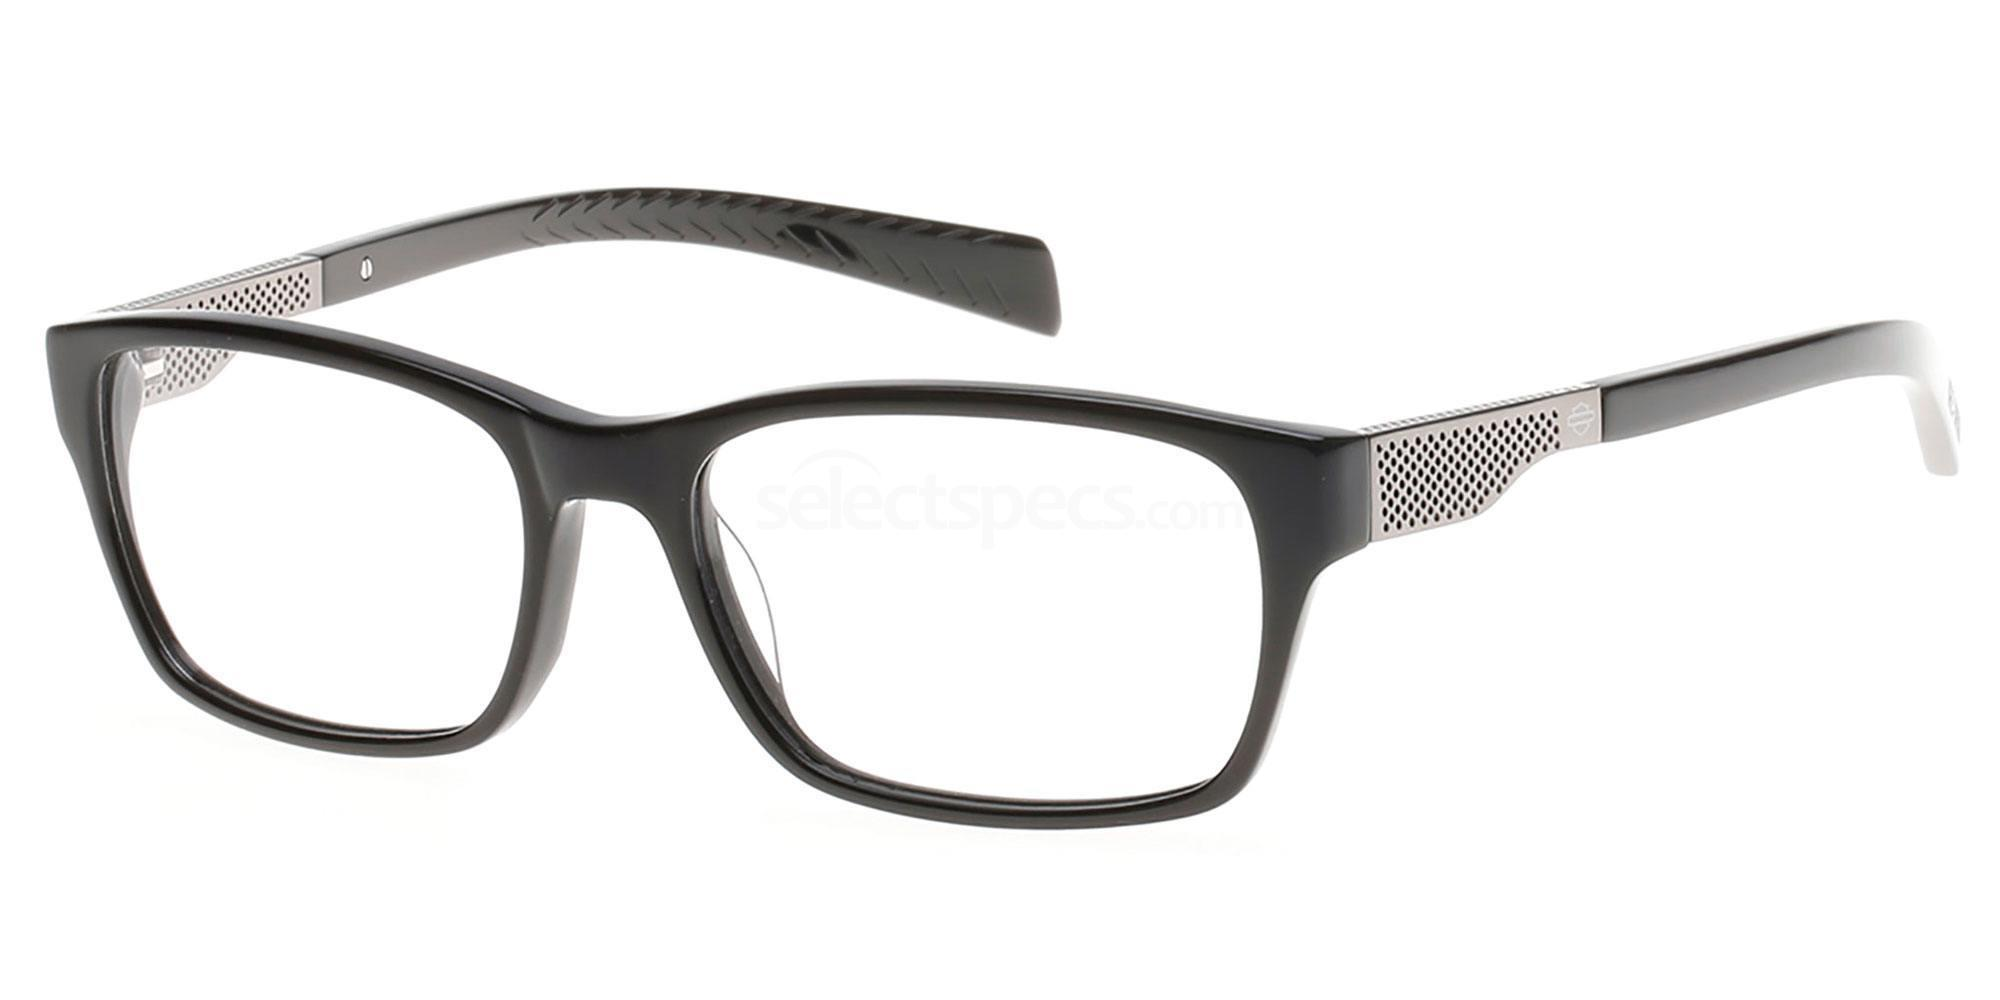 001 HD 1004 Glasses, Harley Davidson